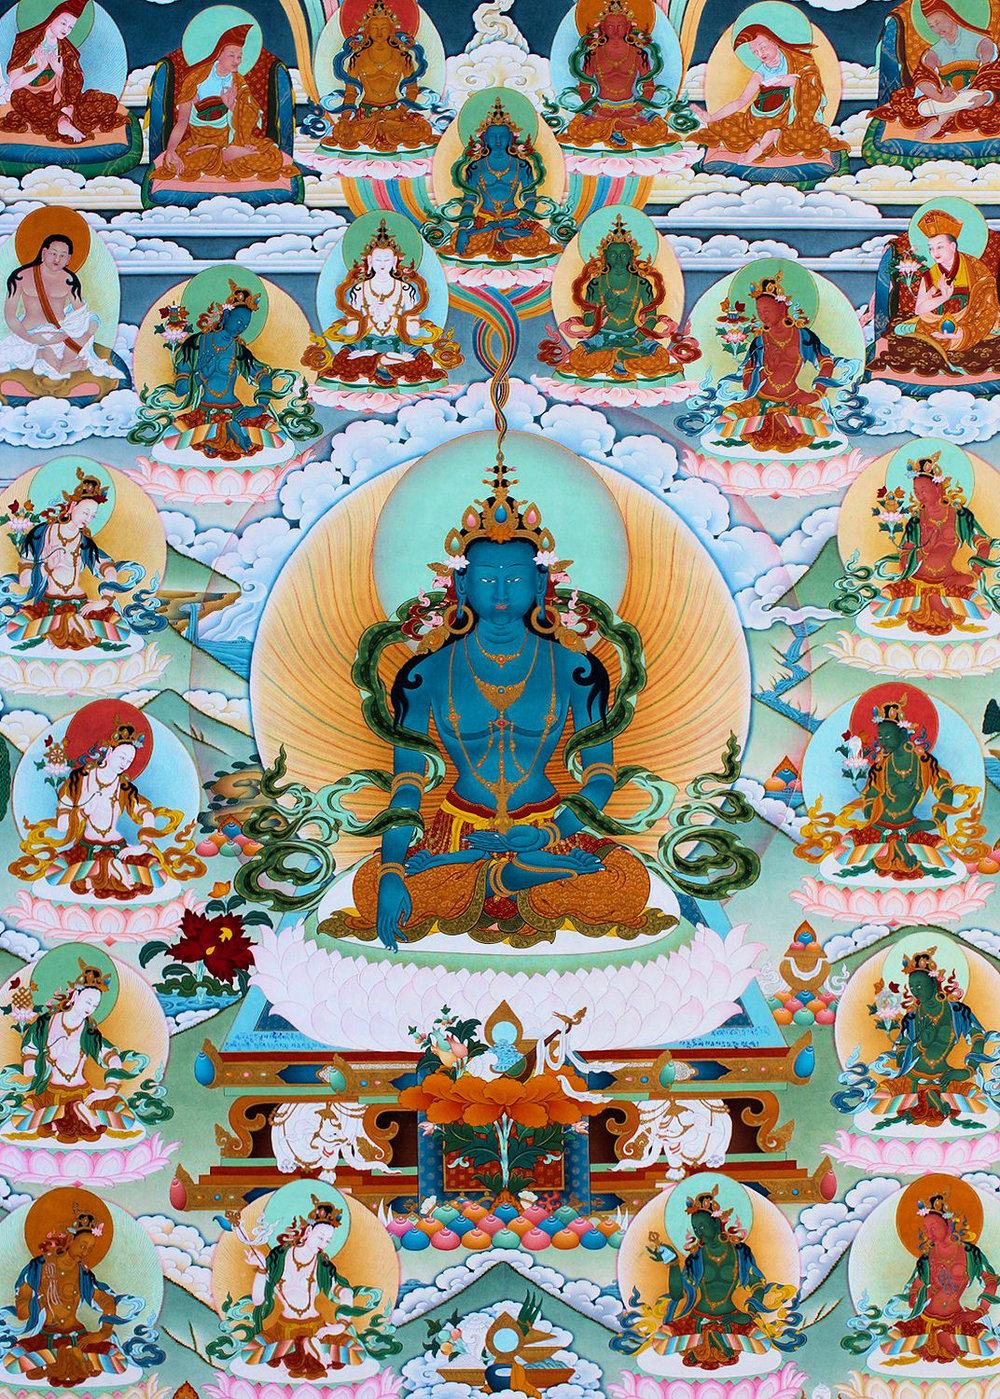 Buddha Akshobhya in Sambhogakaya form - a Dechen Choekhor's Buddha Akshobhya Thangka created according to the sacred vision of the late 8th Kyabgon Adeu Rinpoche